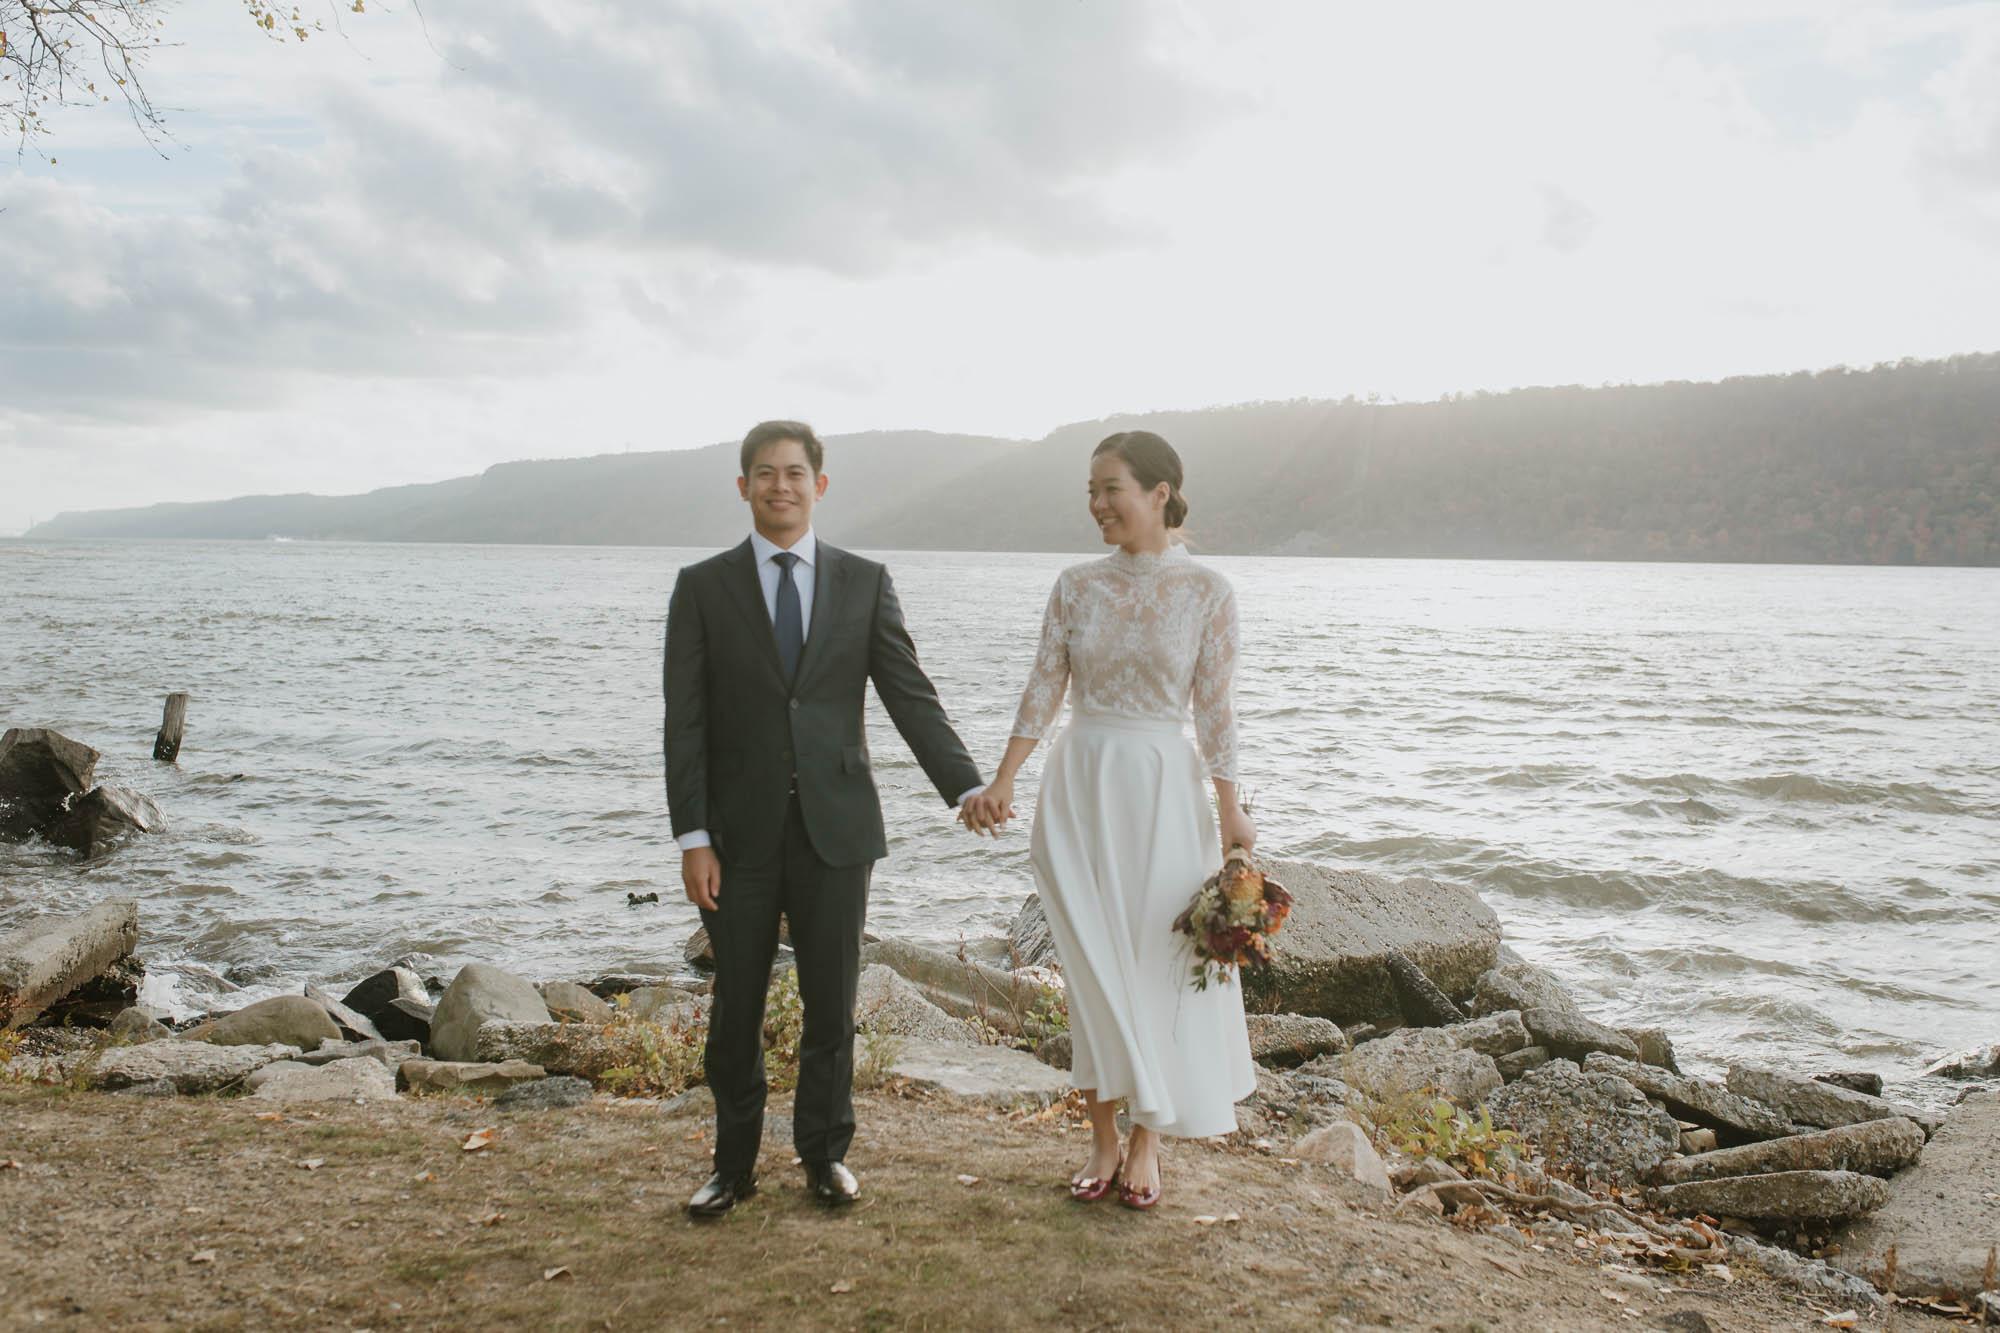 hastings-on-hudson-wedding-photographer-5.jpg